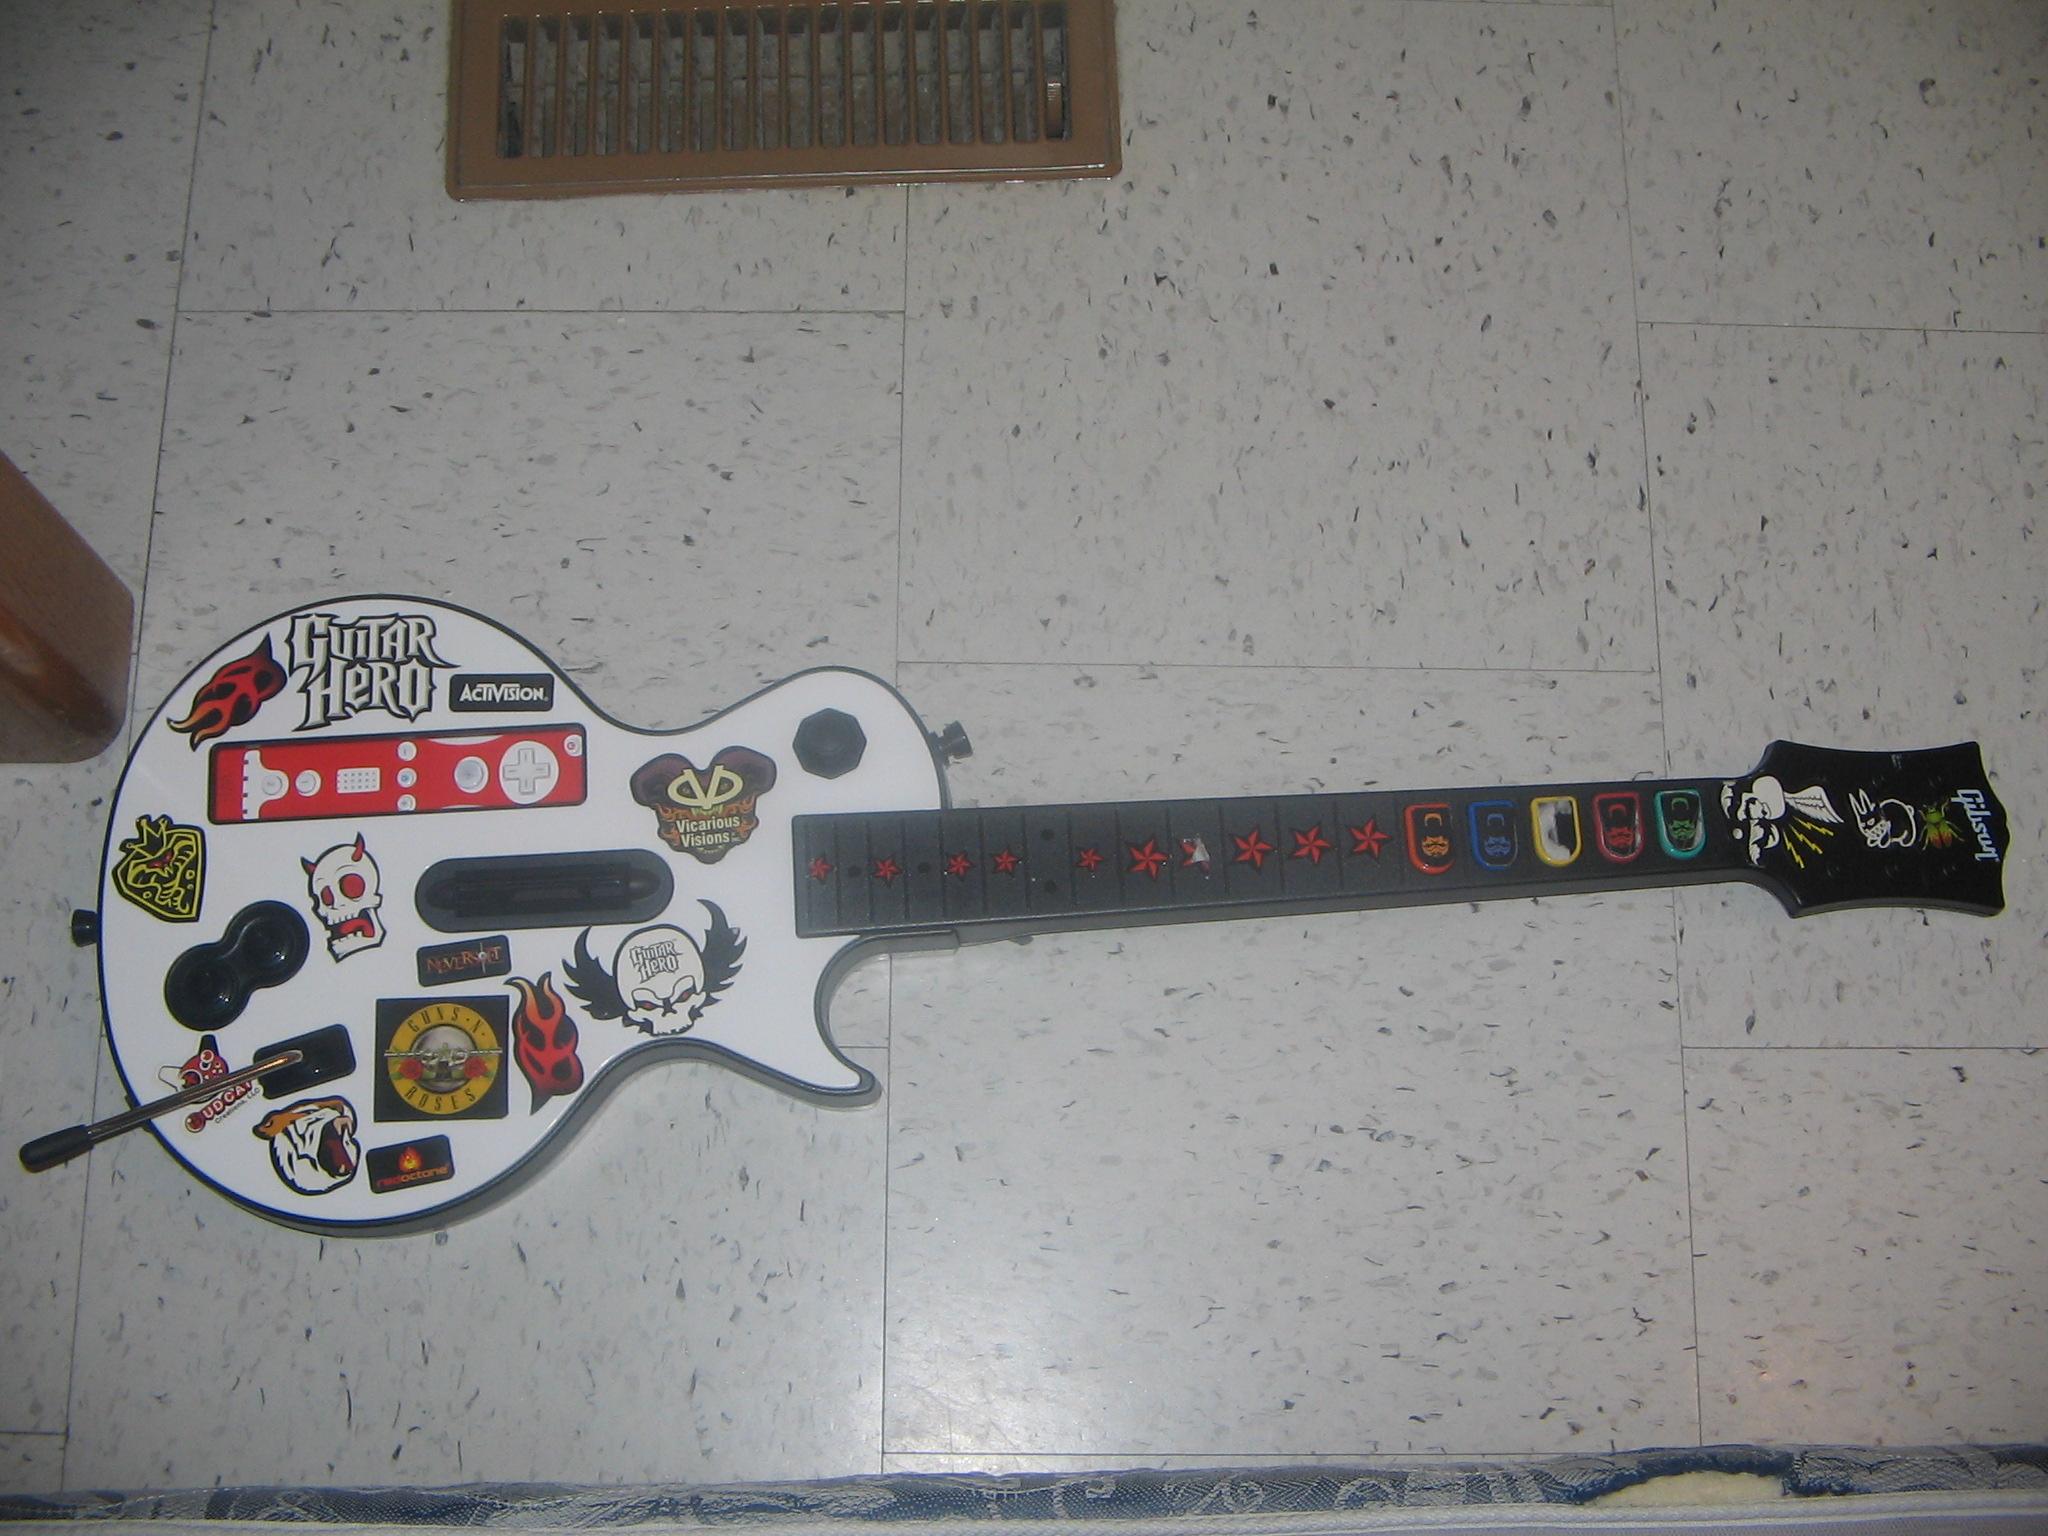 file guitar hero 3 guitar for the wii wikimedia mons